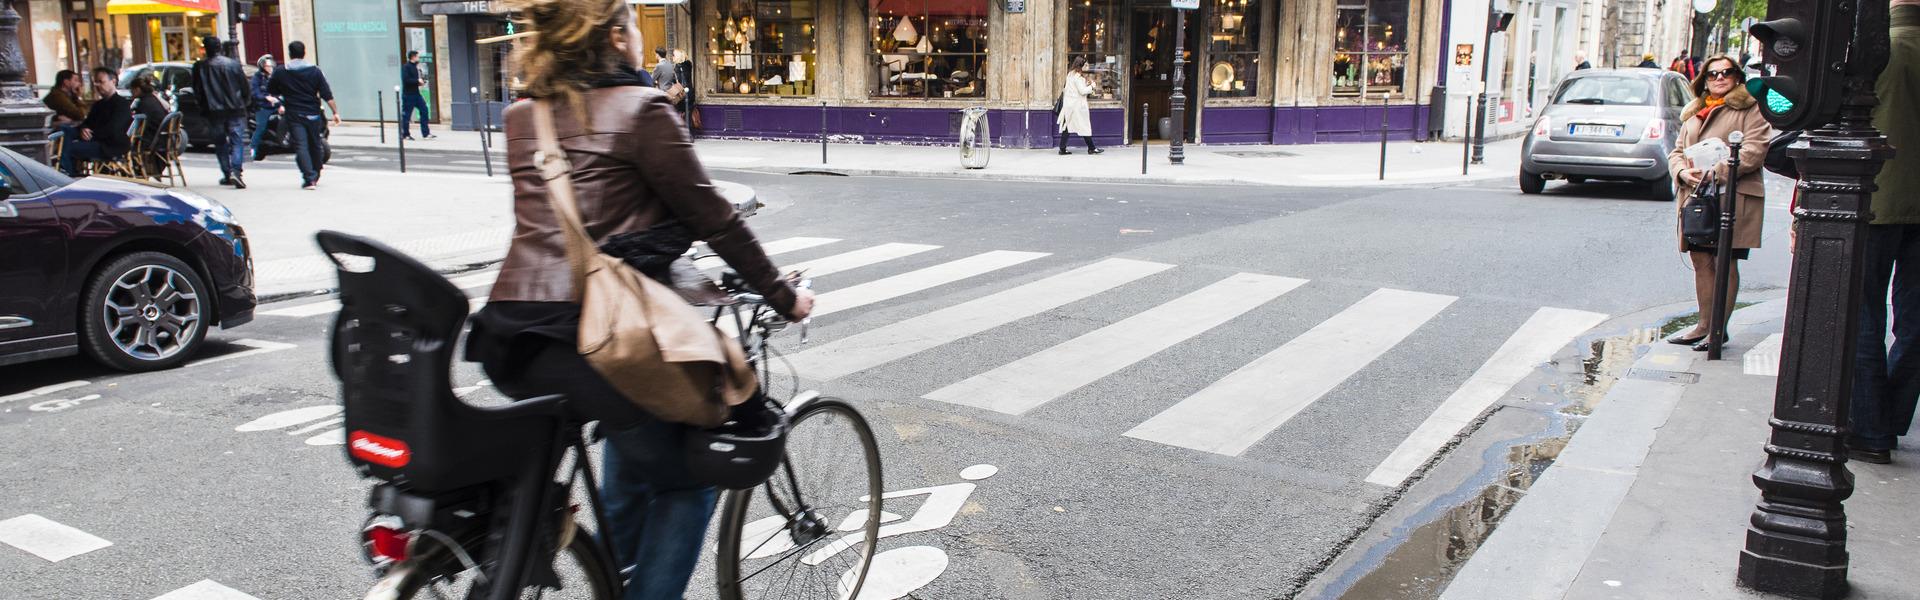 Sas vélo au feu rouge - vélo, Sas vélo - 2015/04/04 - 26500